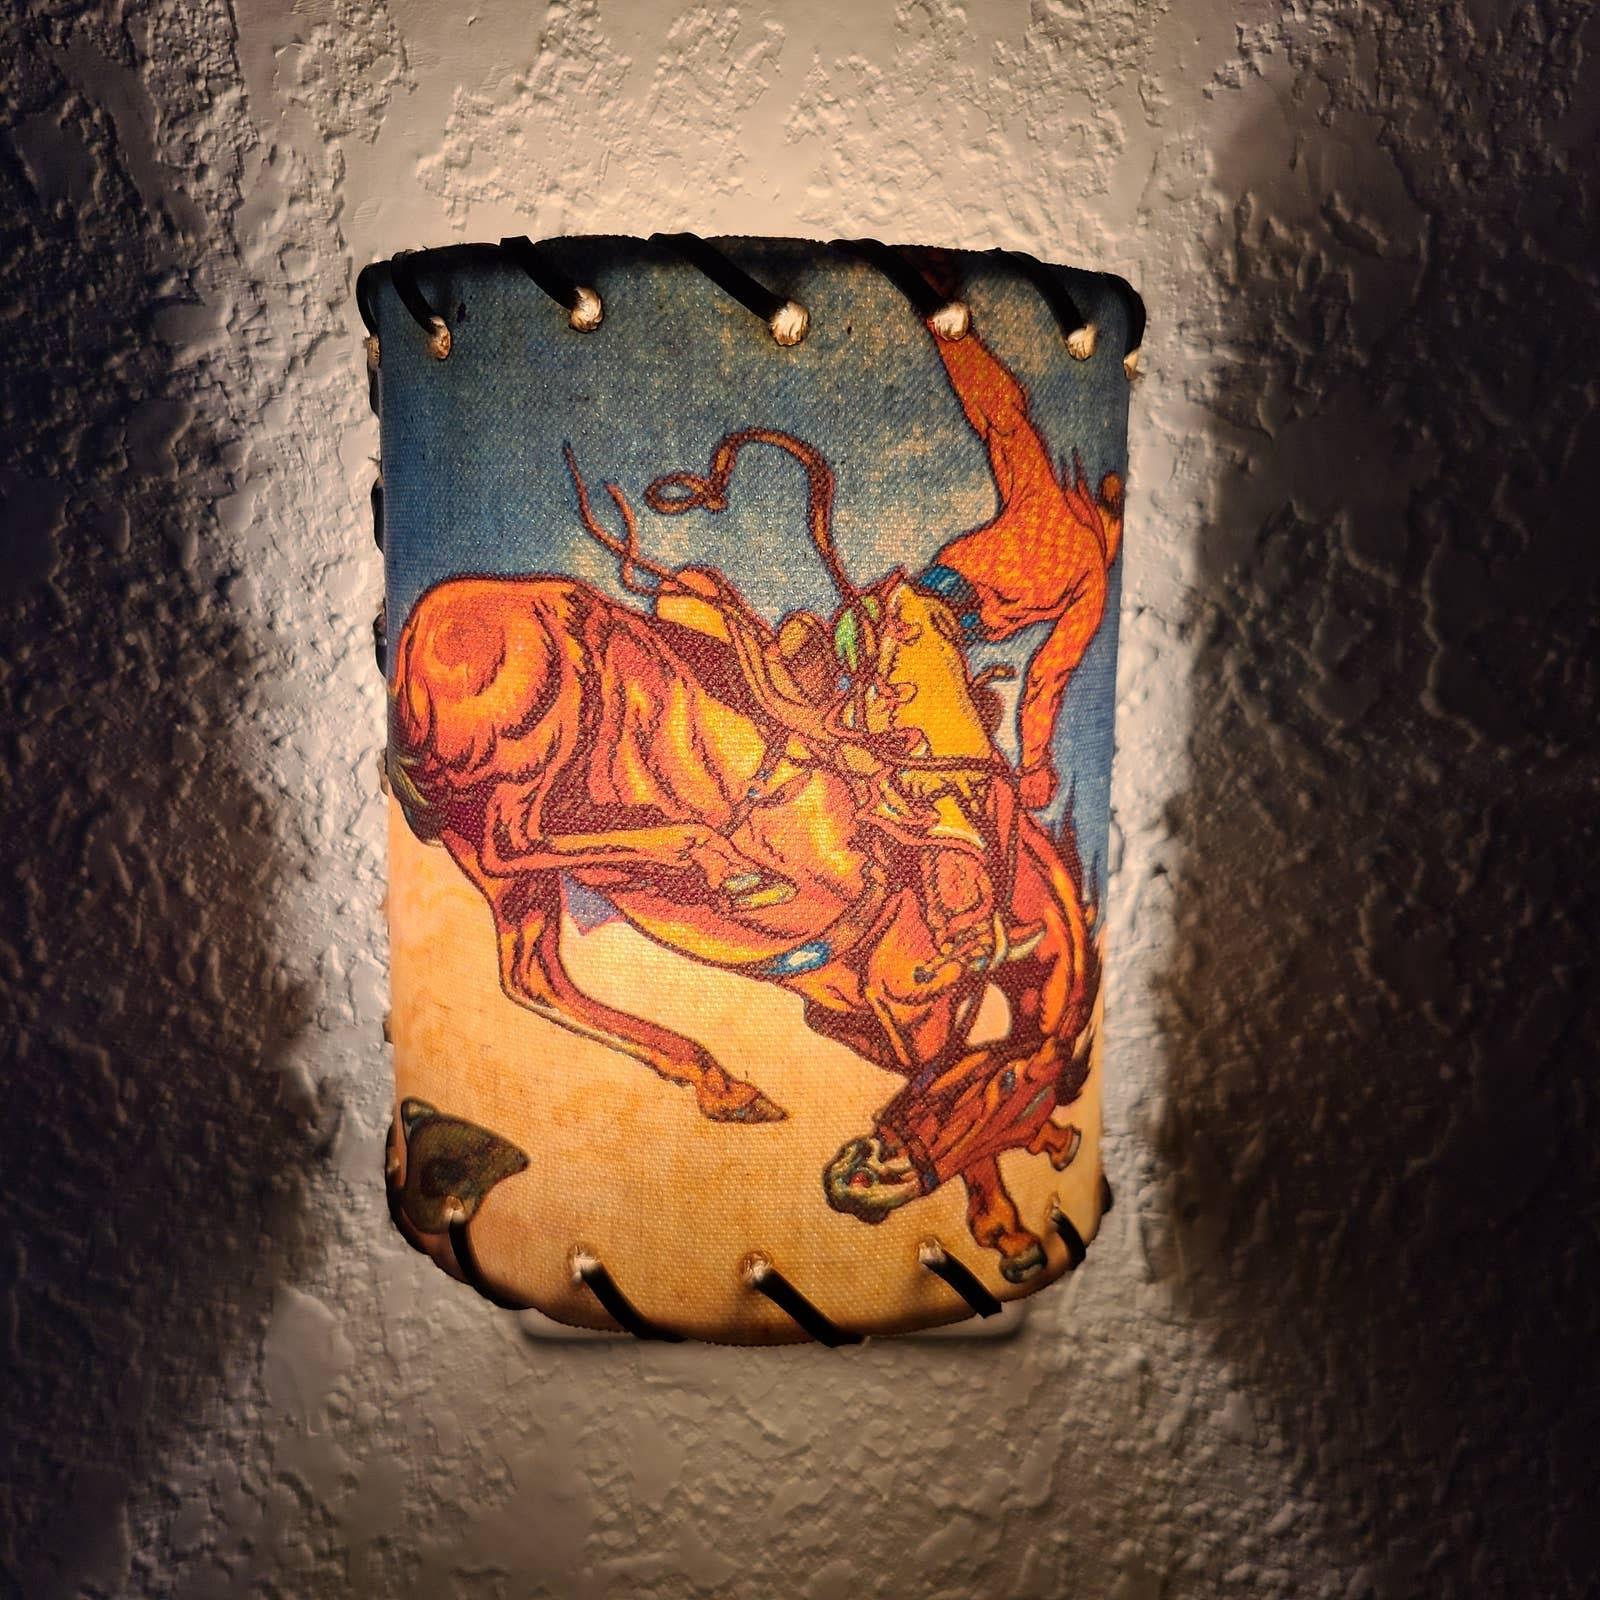 Vintage Cowboy Horse Rider Plugin Night Light - Leather Weave Frame